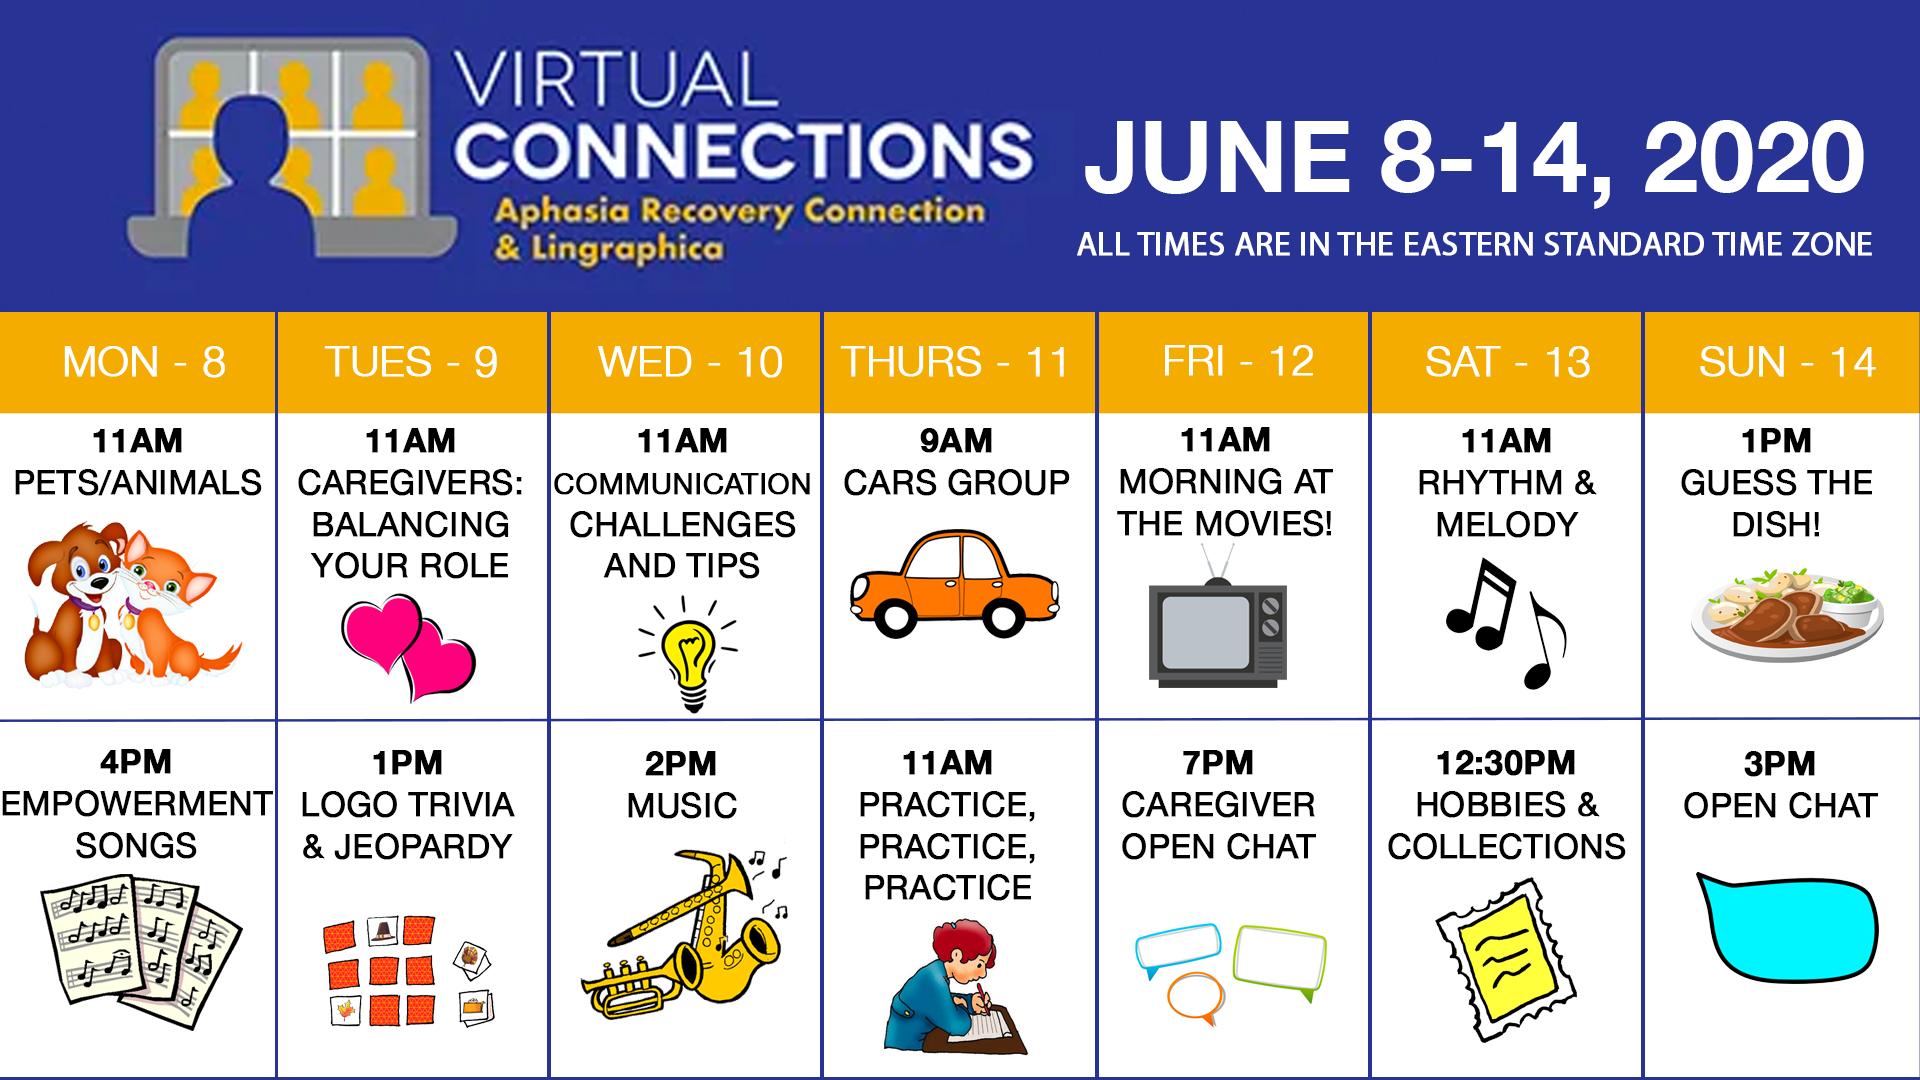 virtual connections schedule_june8-14-1